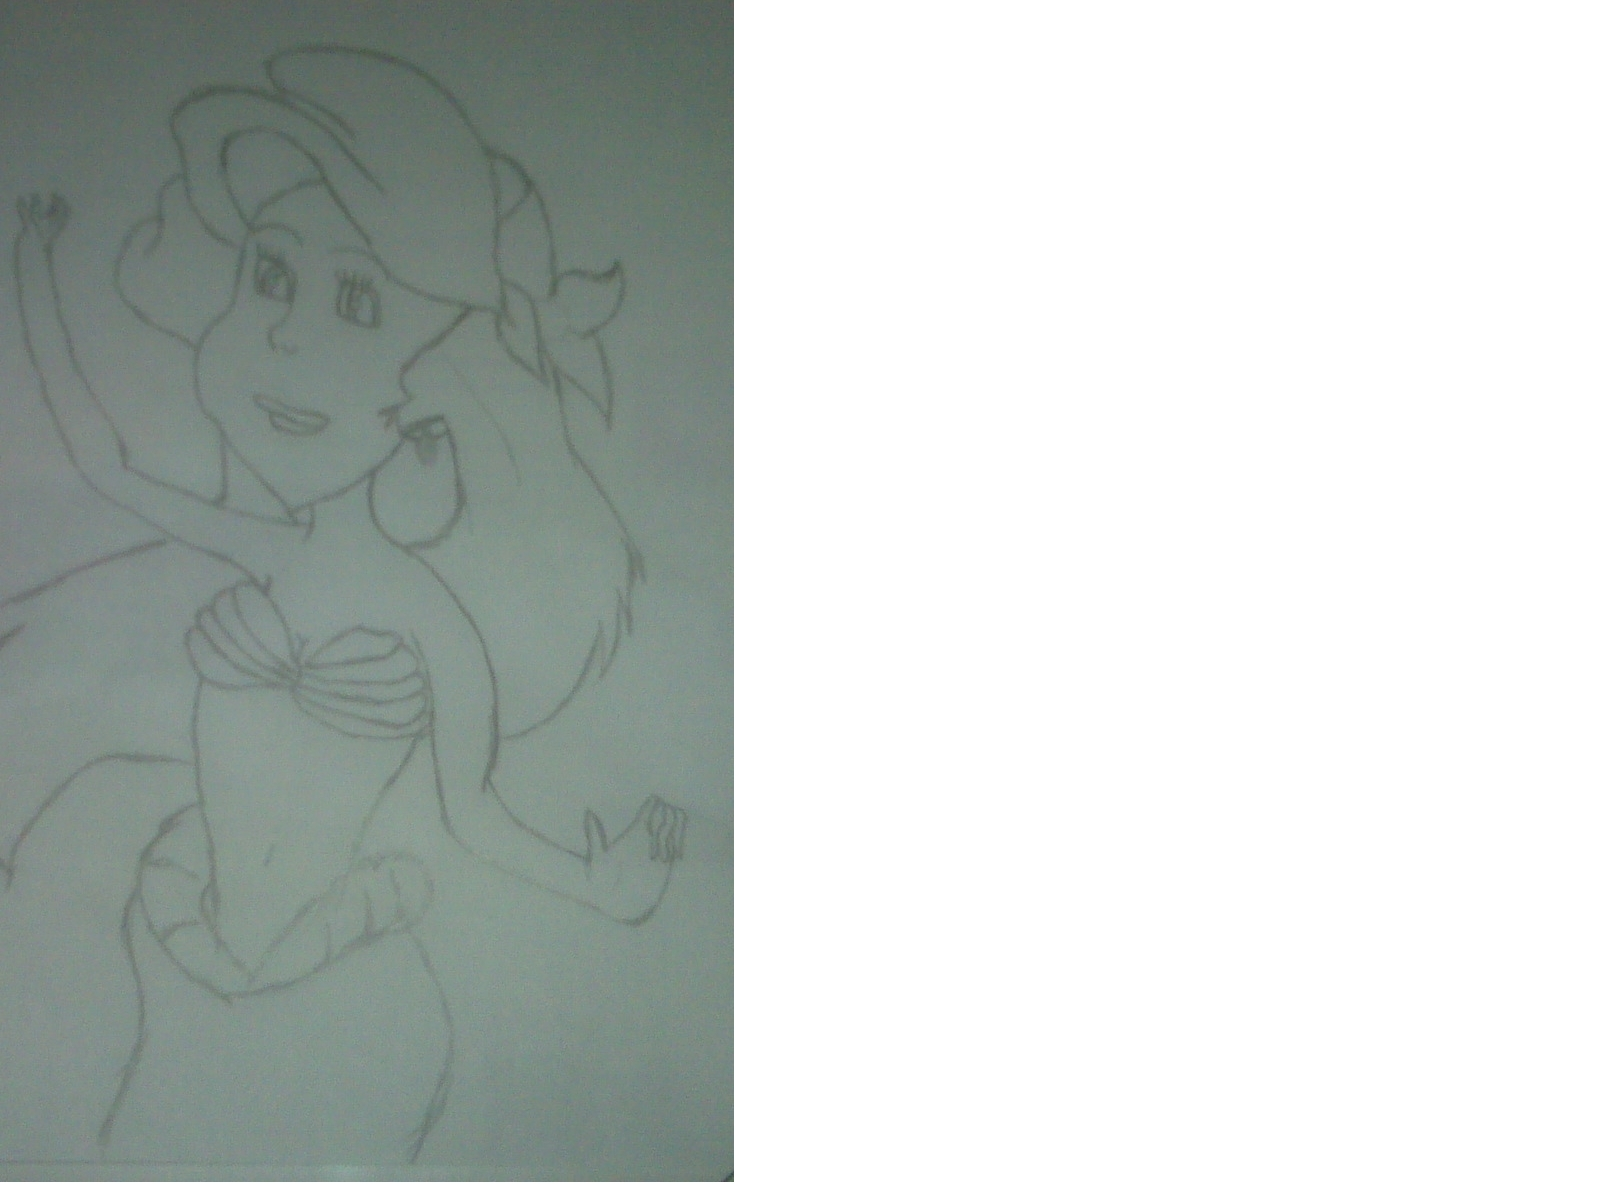 My Ariel Drawing